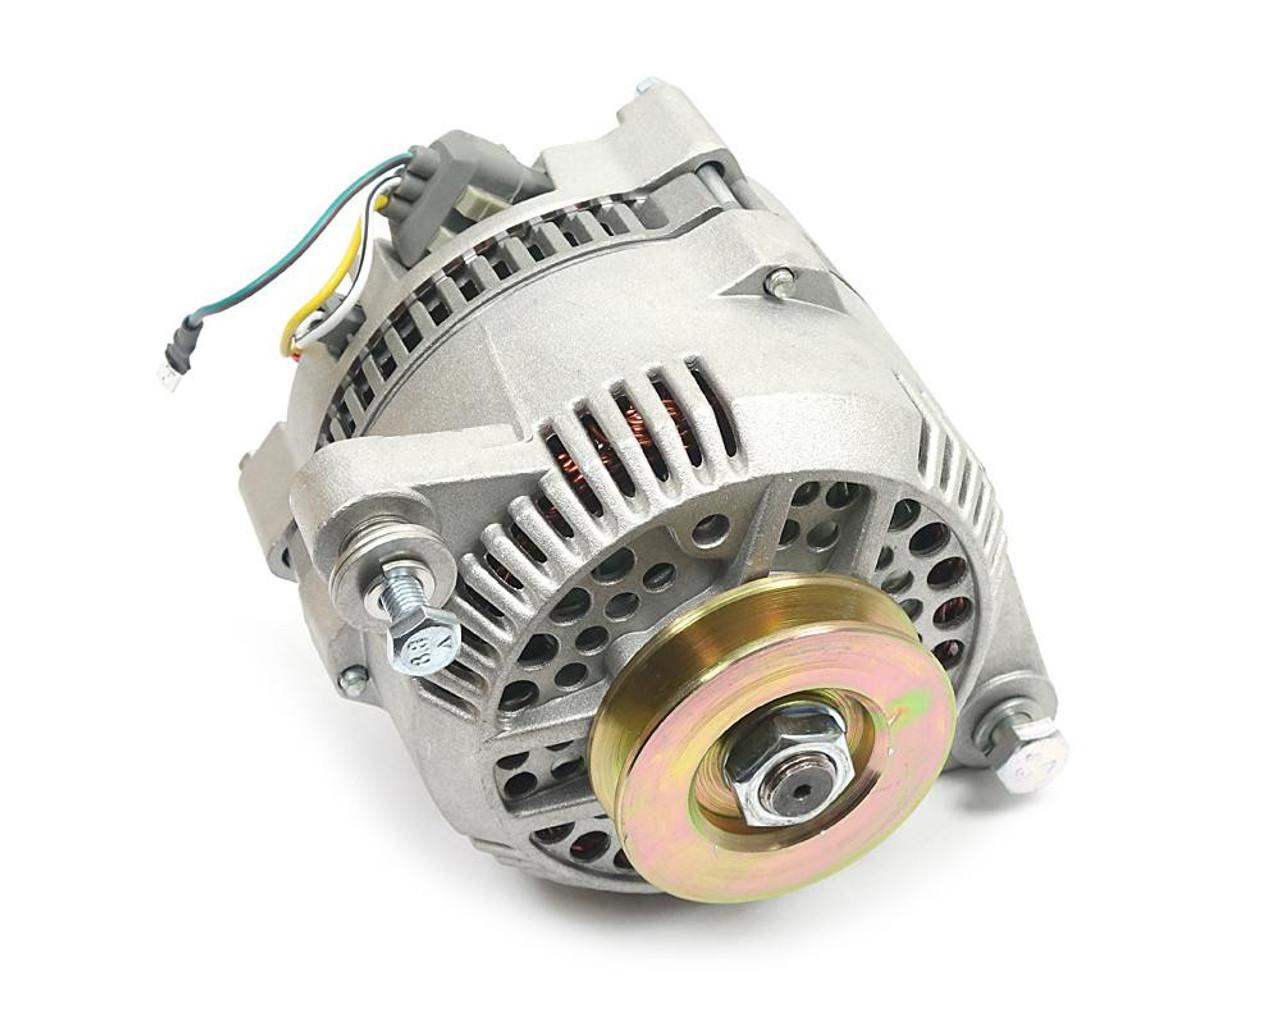 95 amp High Performance Alternator